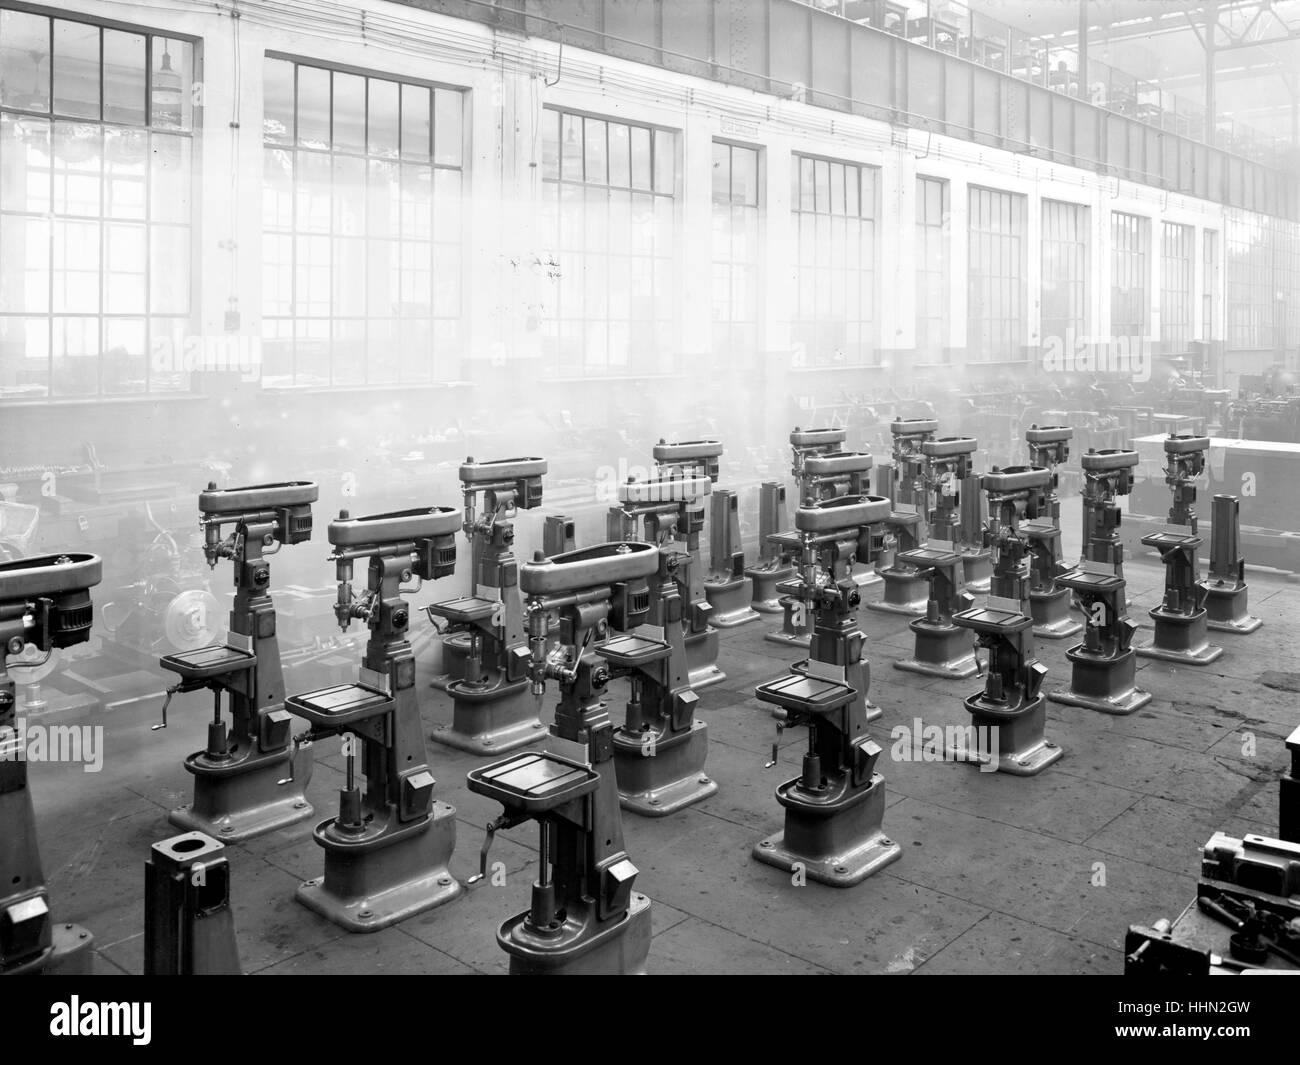 1930 - 40. Fiat - Ansaldo big motors Factory. - Stock Image